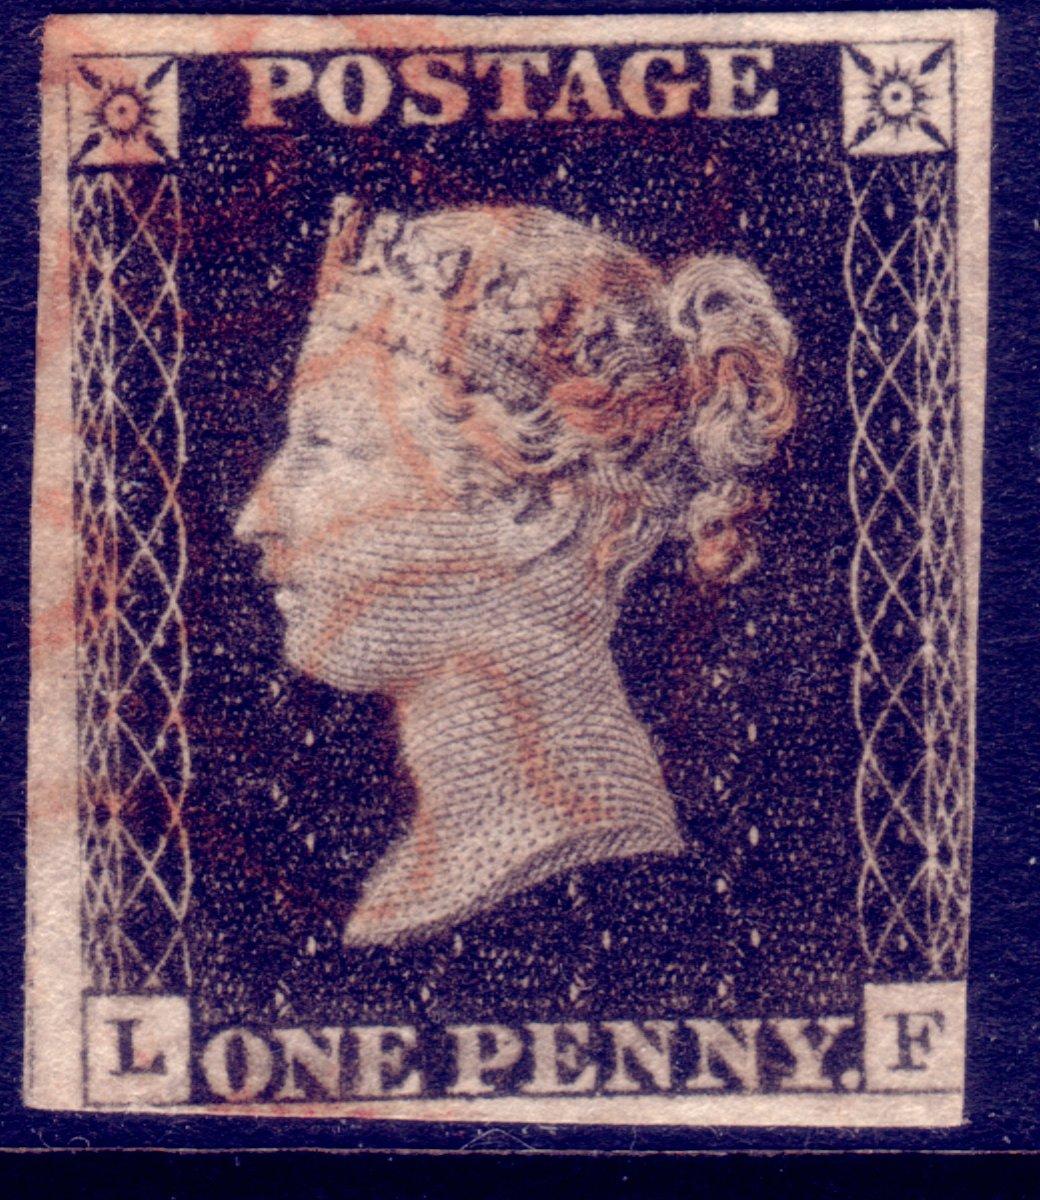 1840 1d Black Plate 5 - SOLD